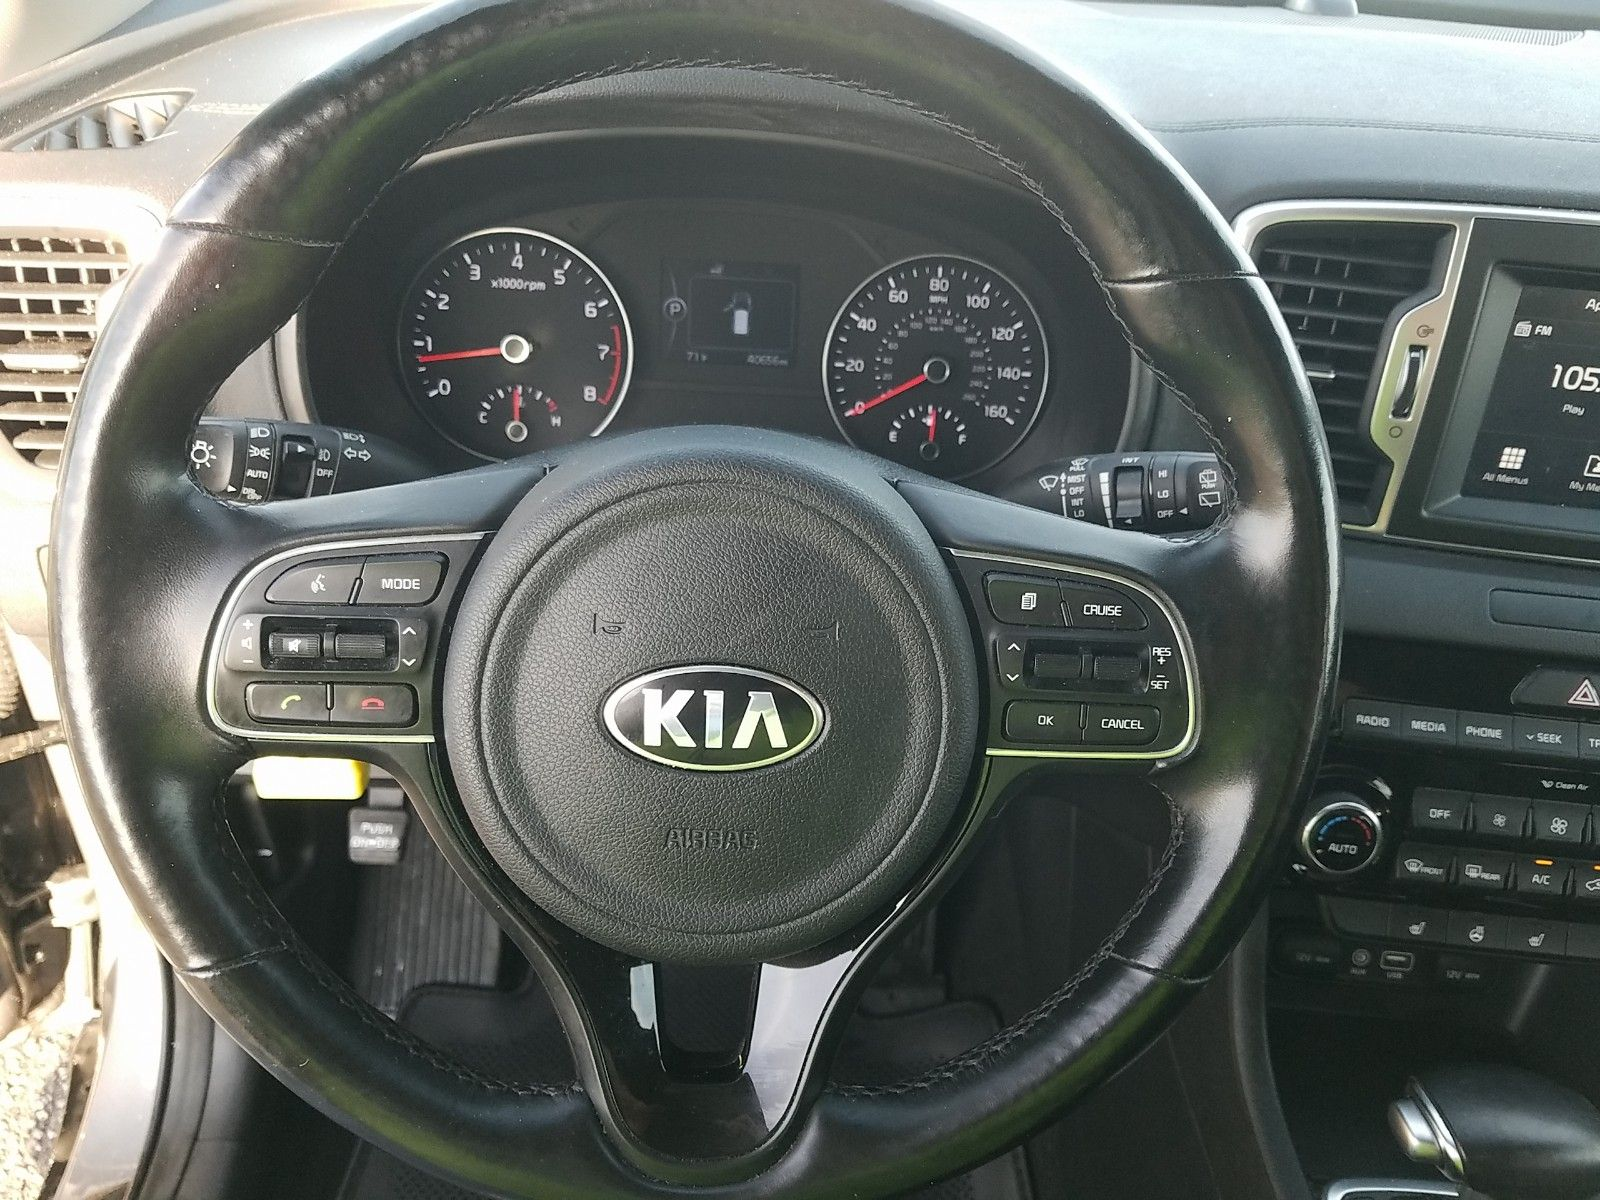 2019 KIA SPORTAGE FWD 4C EX - 10